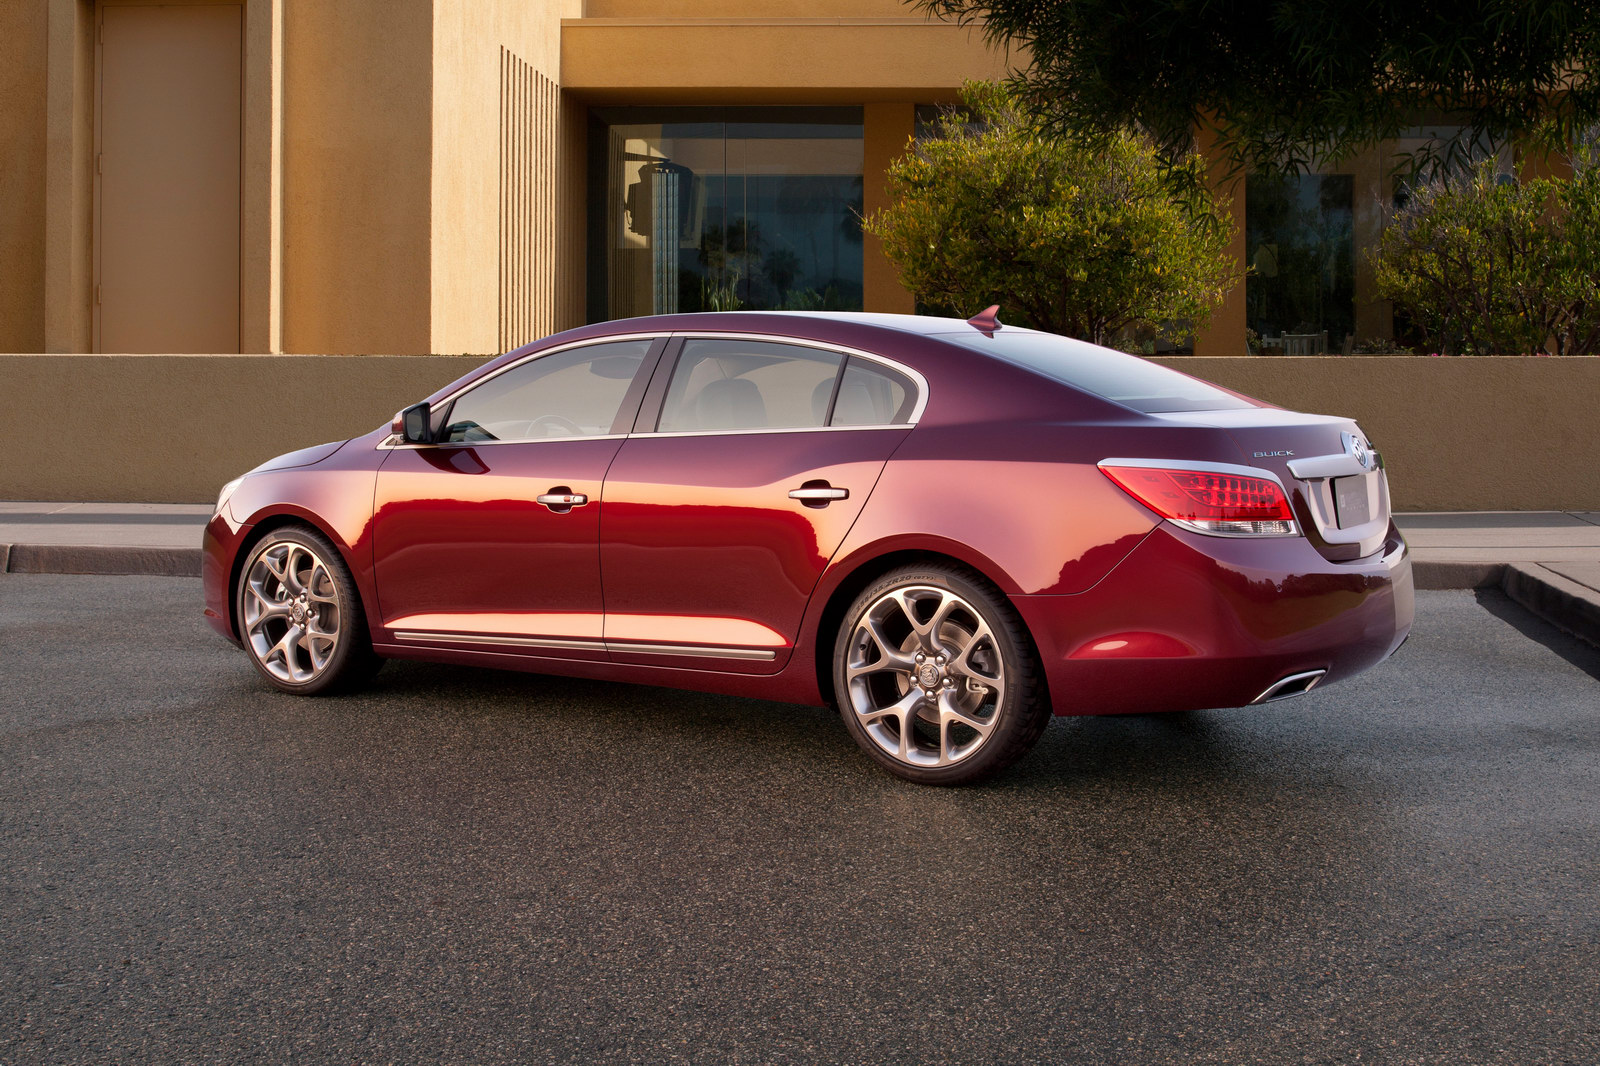 2011 Buick Lacrosse Gl Concept To Debut At La Auto Show